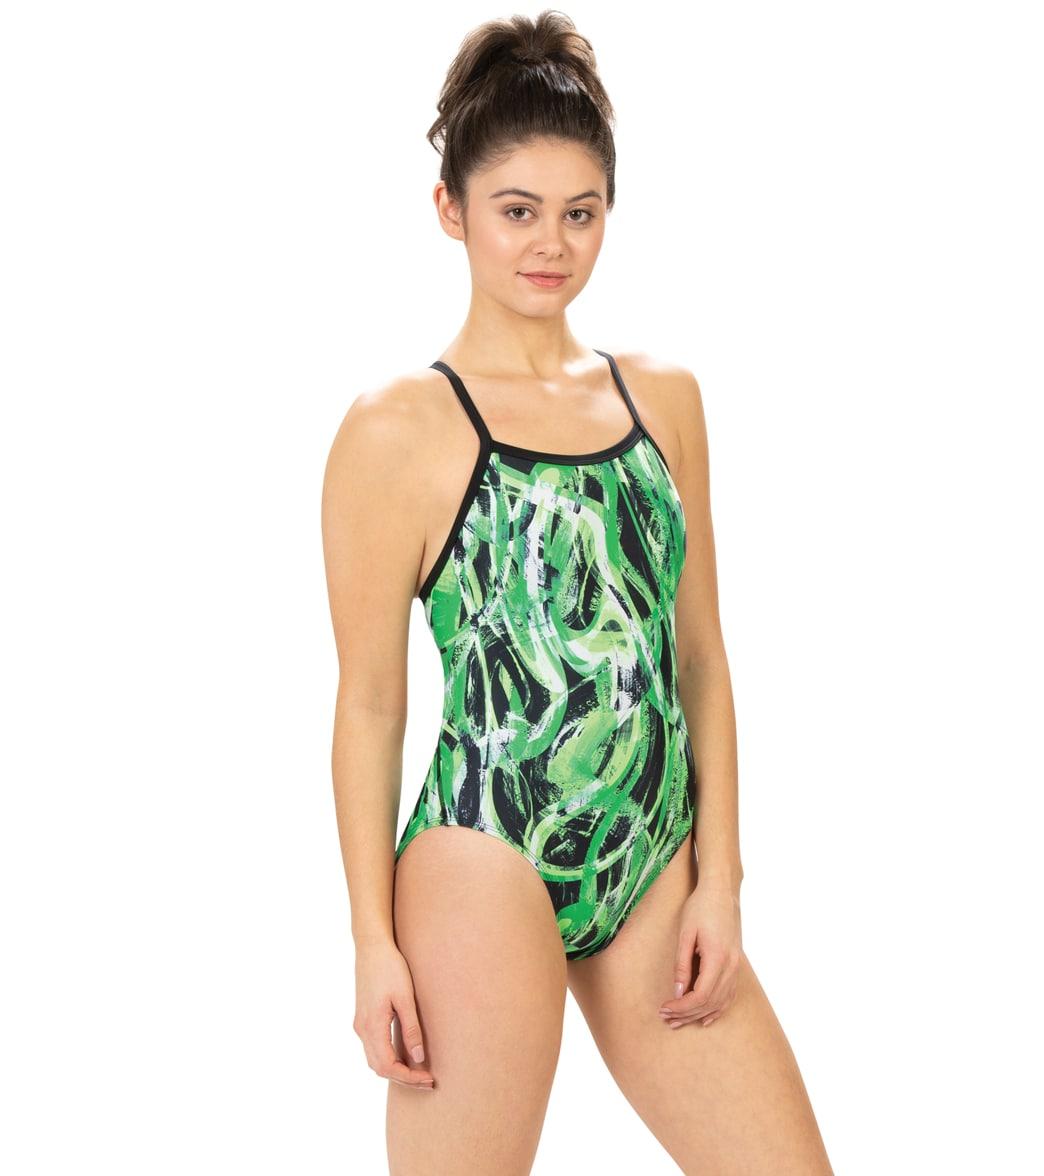 Dolfin Women's Xtrasleek Eco Supernova V-2 Back One Piece Swimsuit